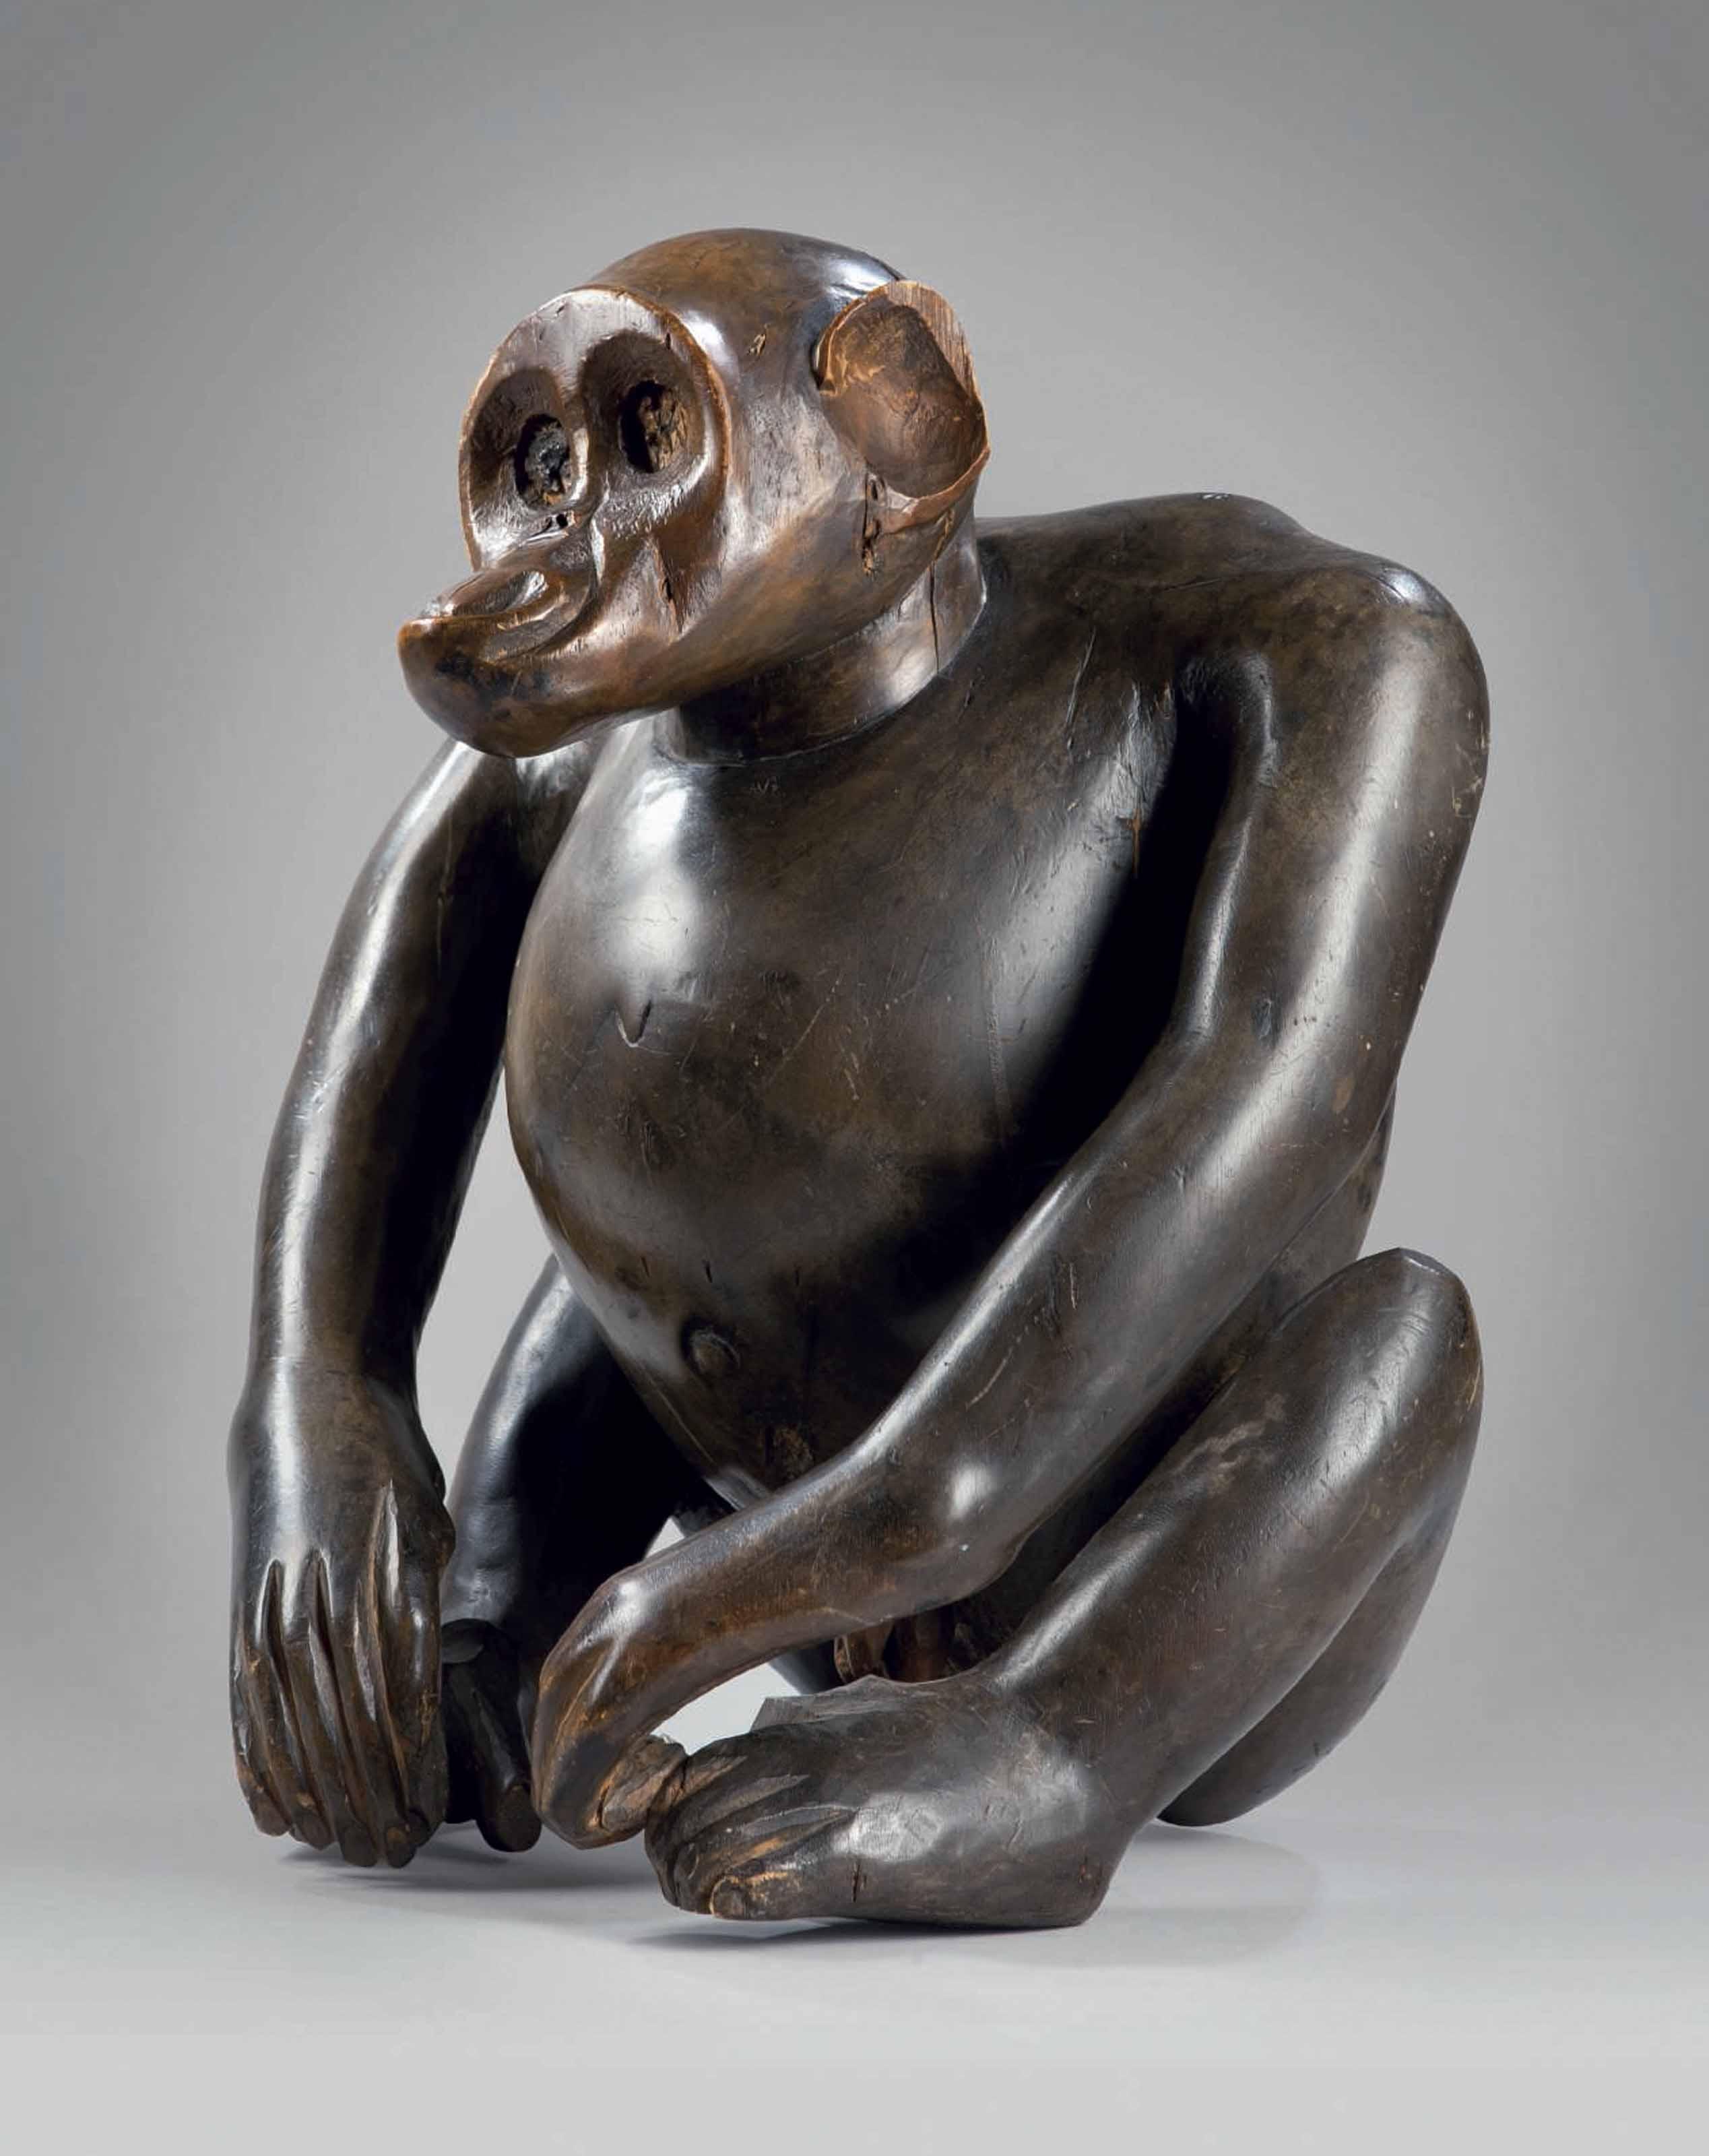 Singe Fang, bulu Fang monkey,